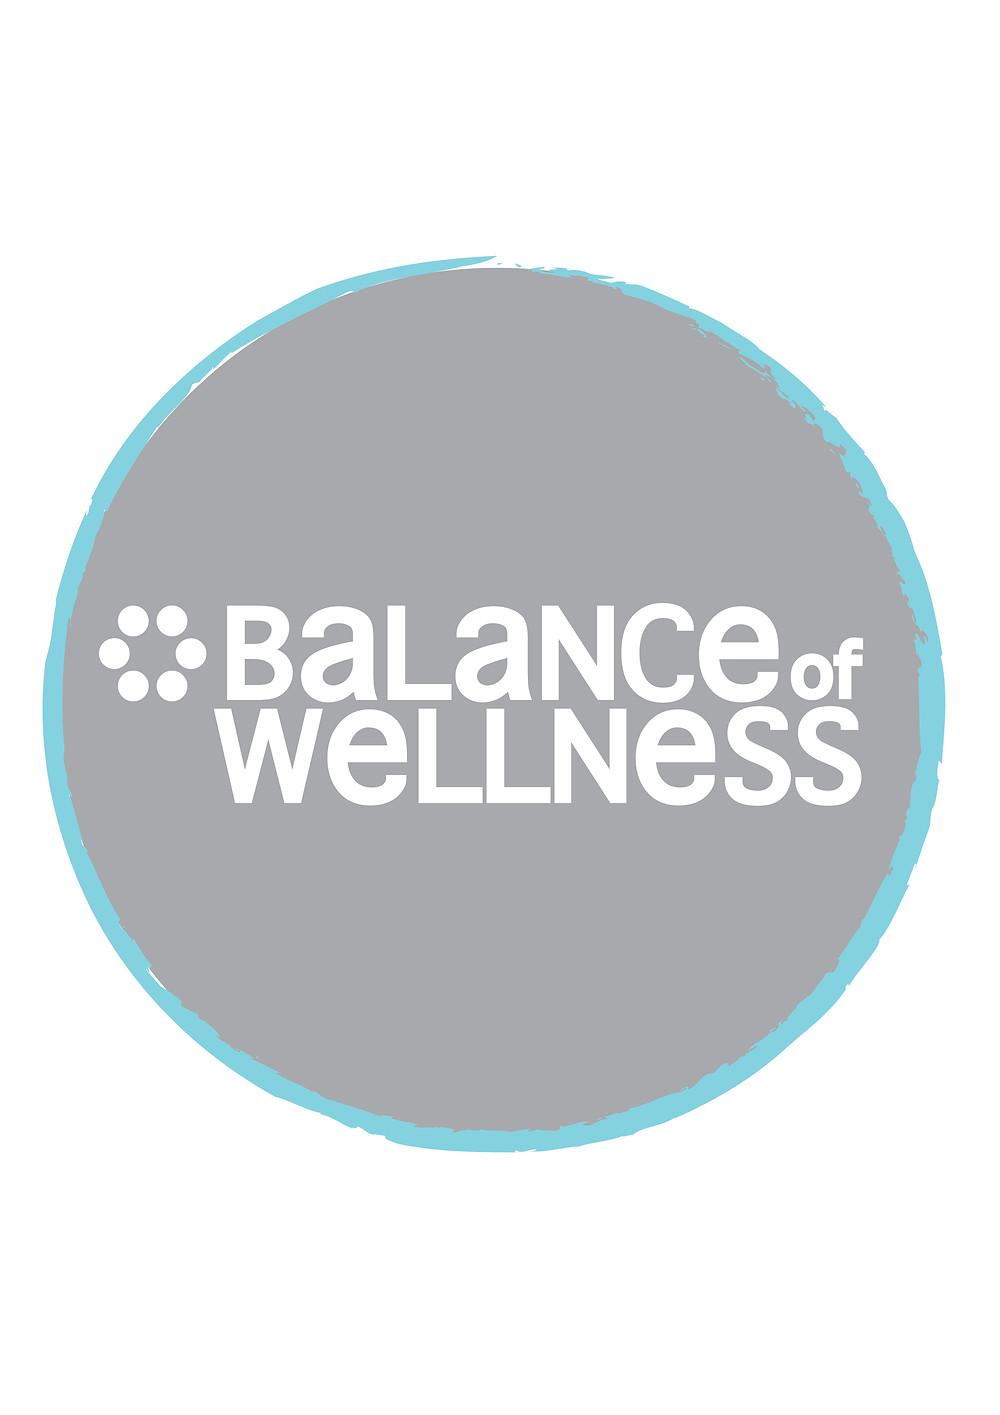 Balance of Wellness - Life and Wellness Coaching